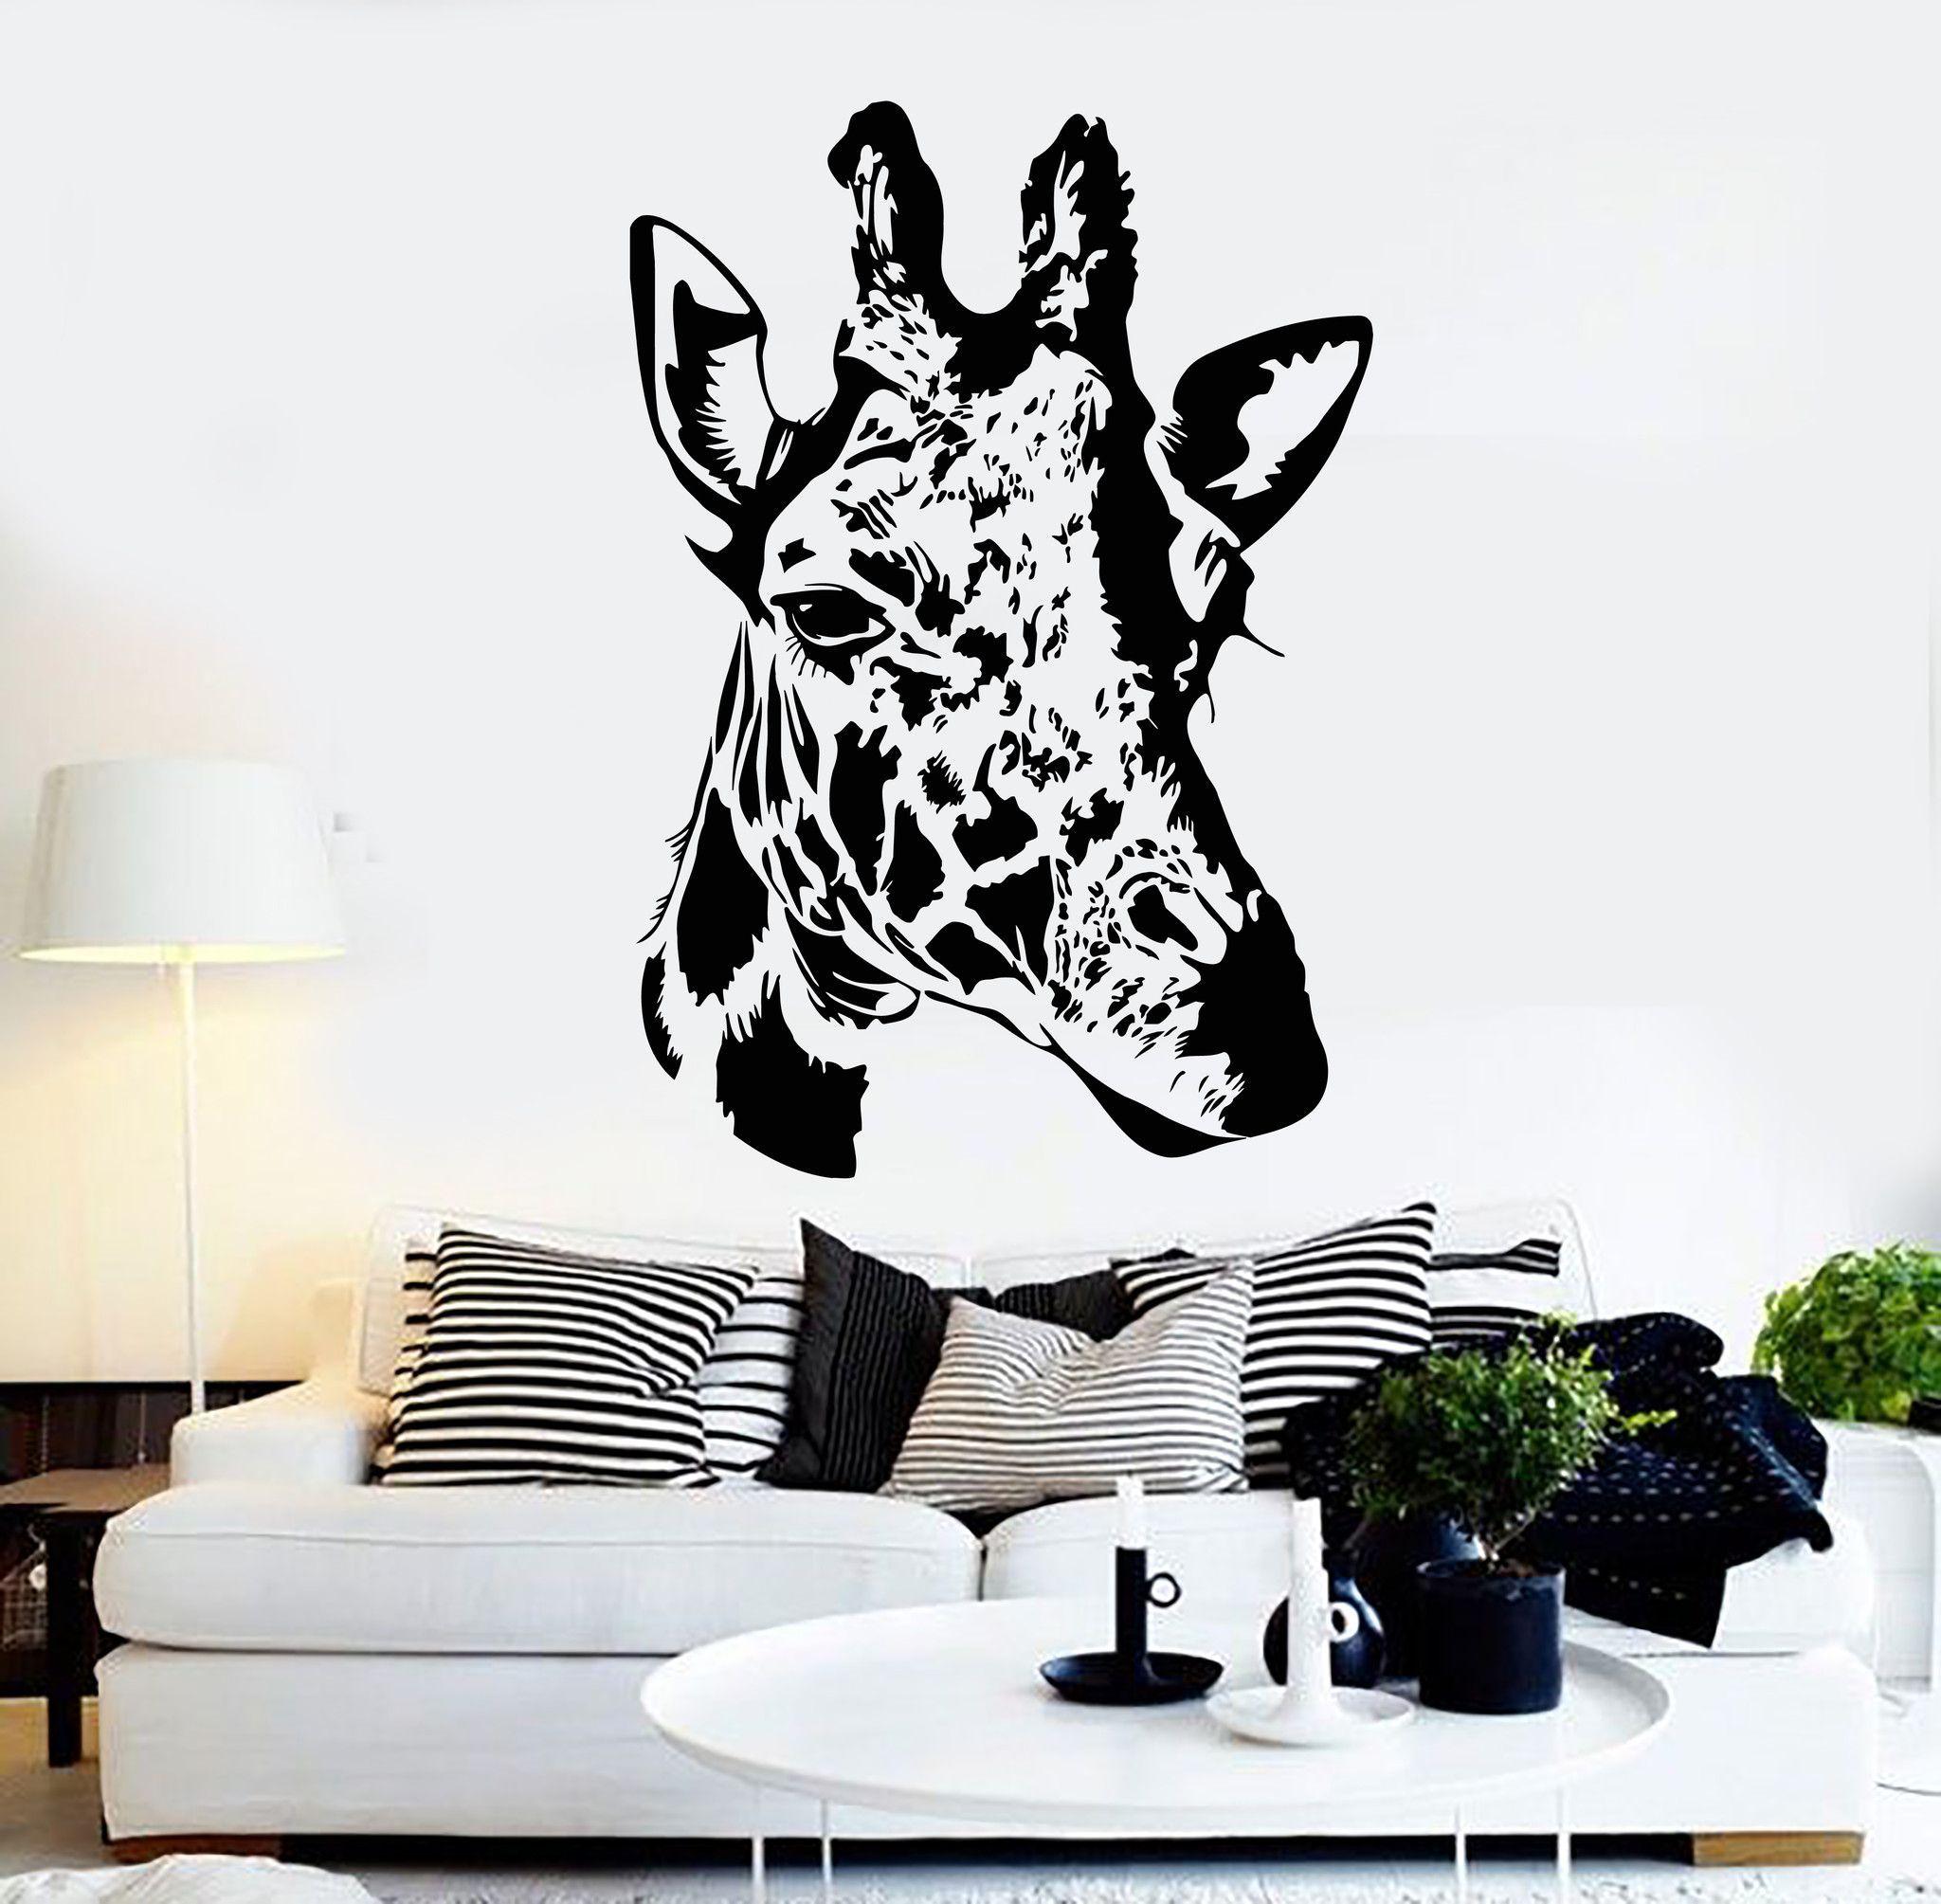 vinyl wall decal giraffe head african animal art stickers mural vinyl wall decal giraffe head african animal art stickers mural ig4613